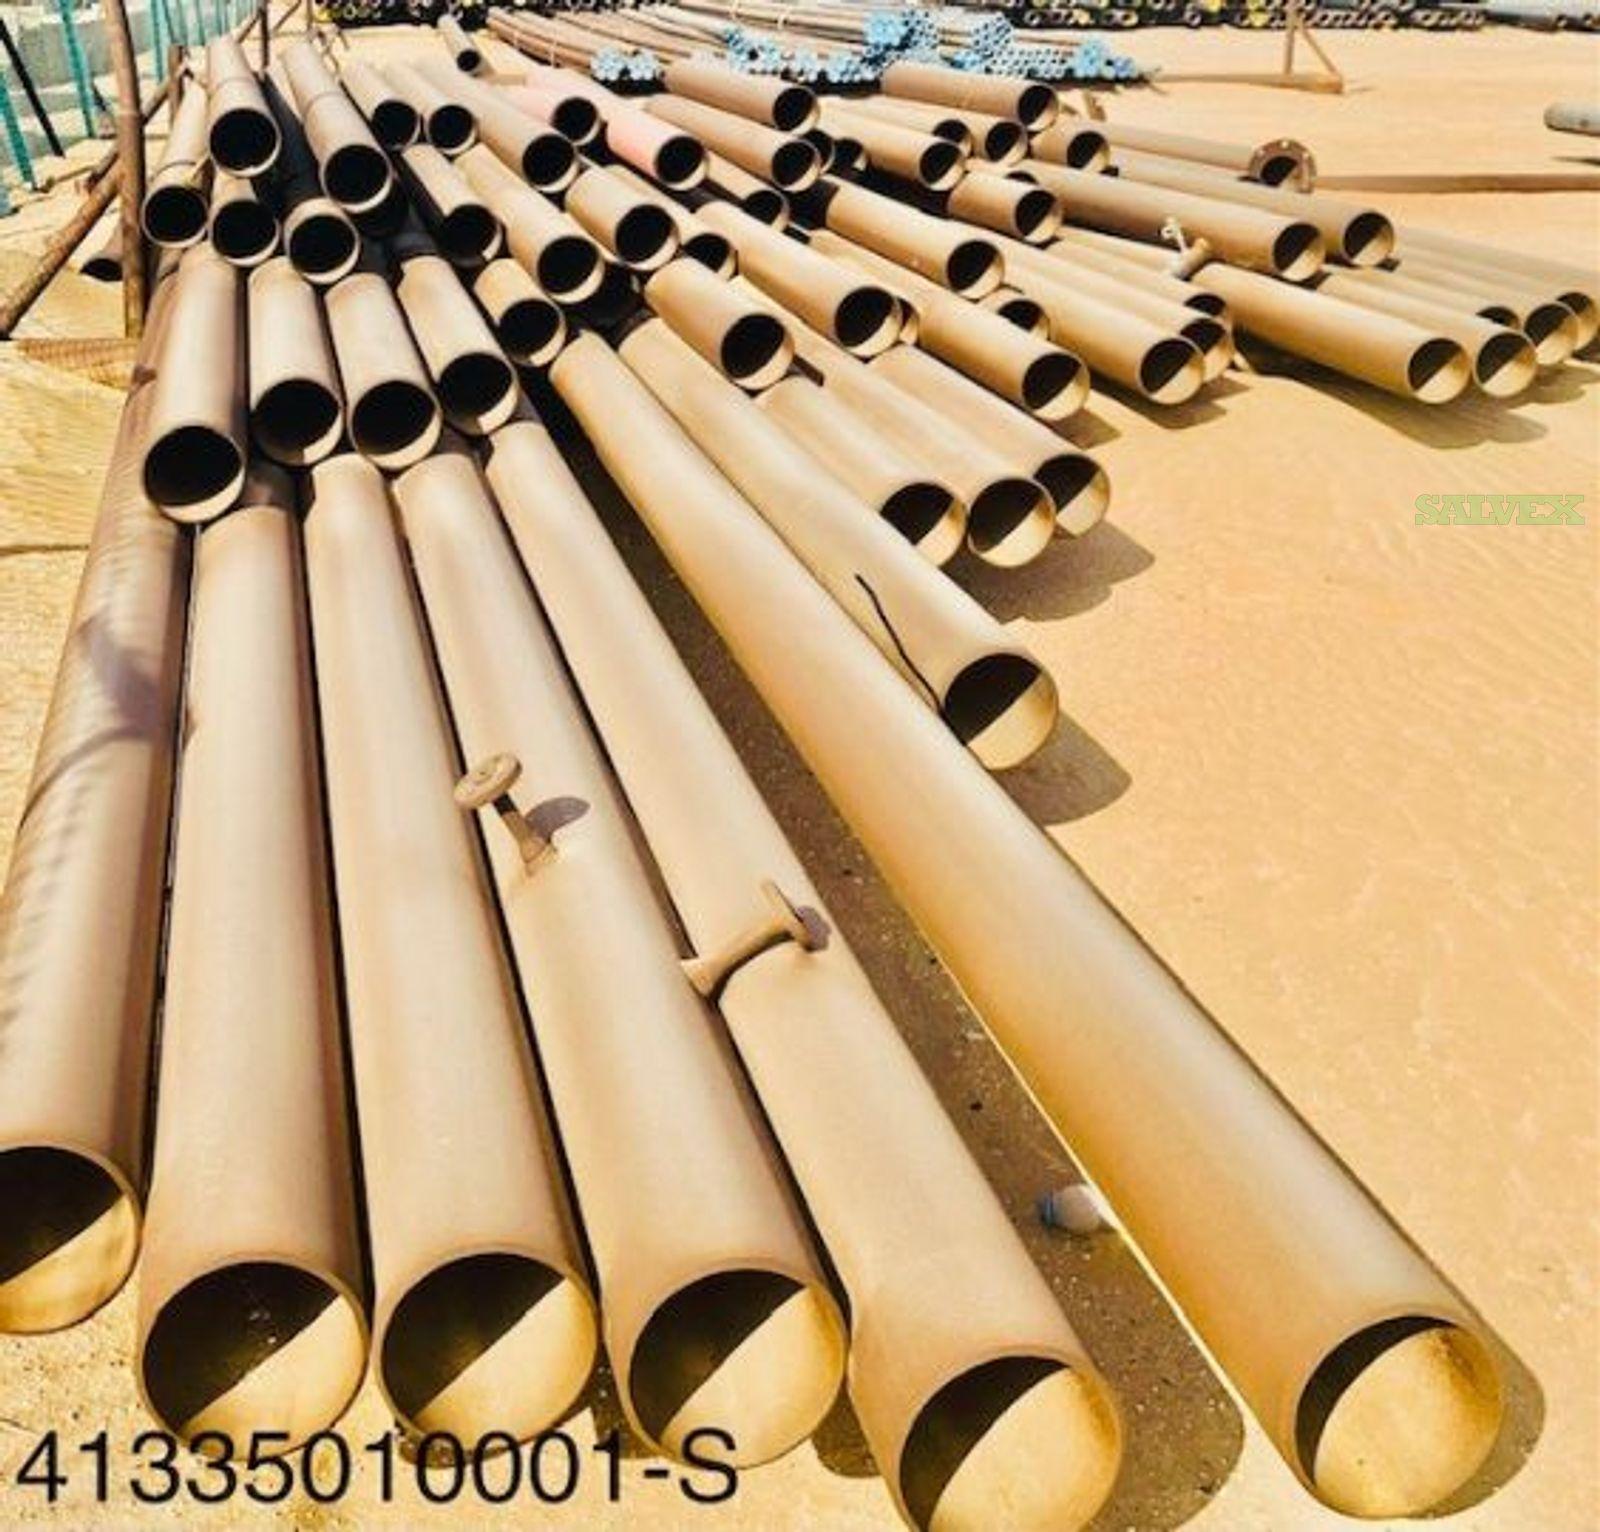 2- 10 Surplus Line Pipe (243 Metric Tons)